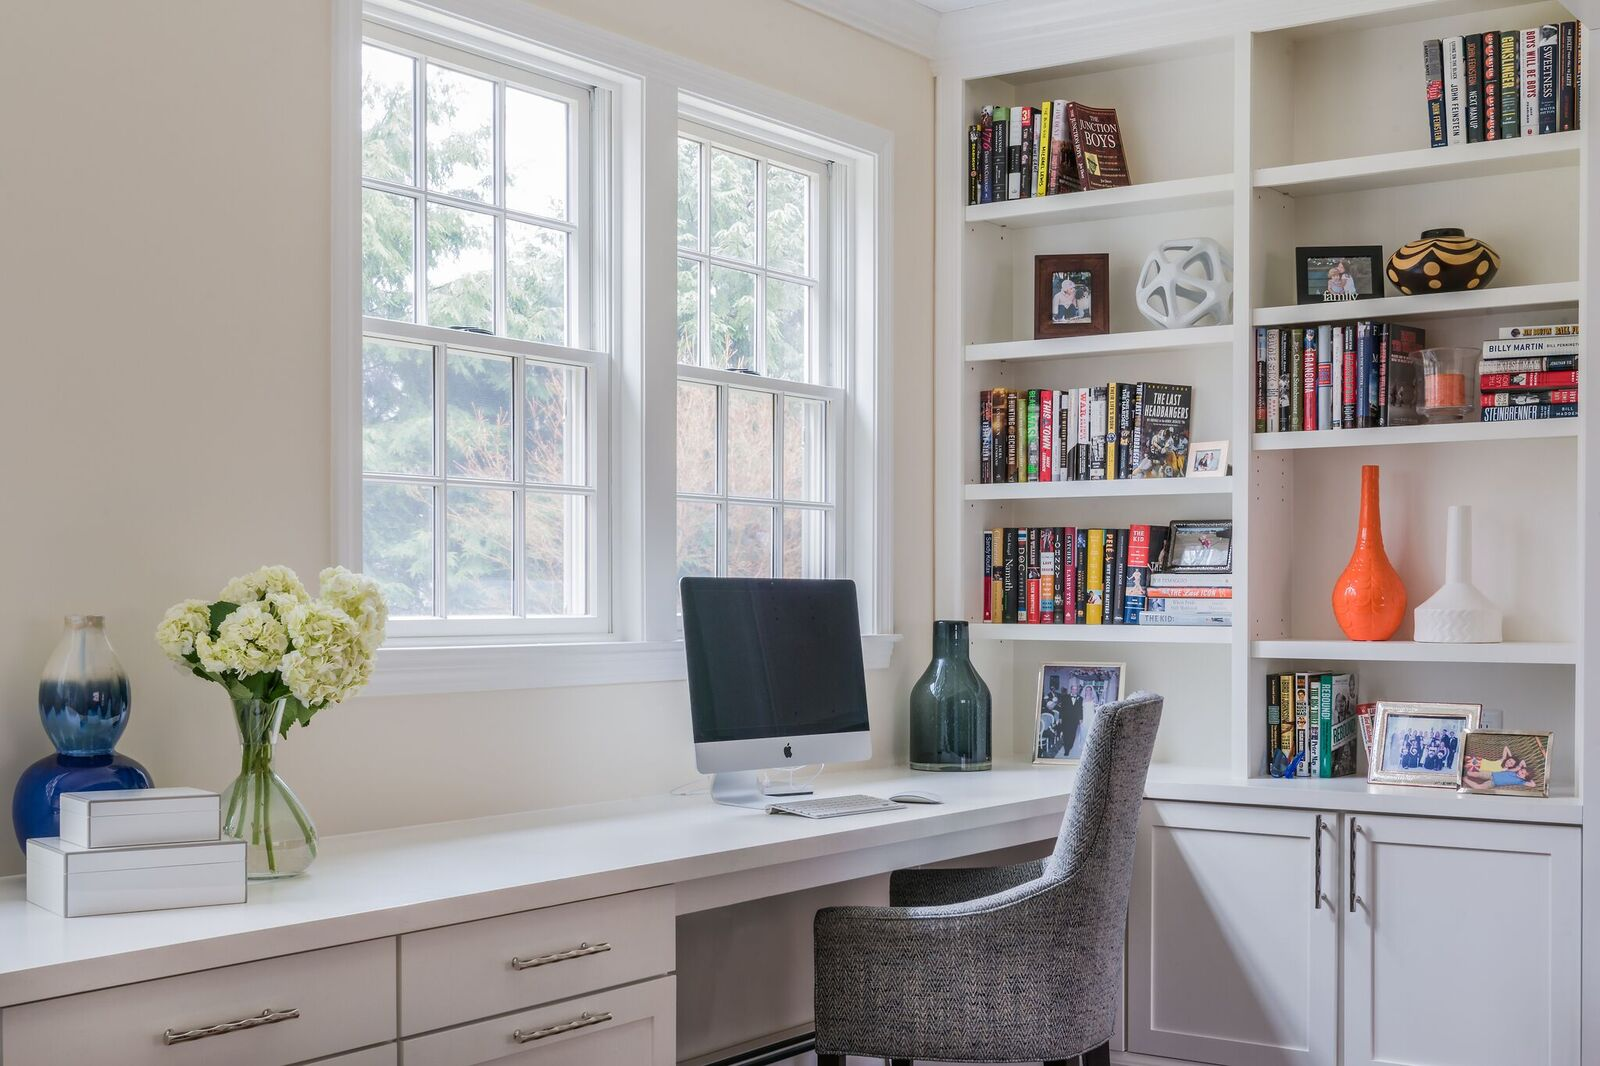 Pic 14 close up of desk corner.jpg